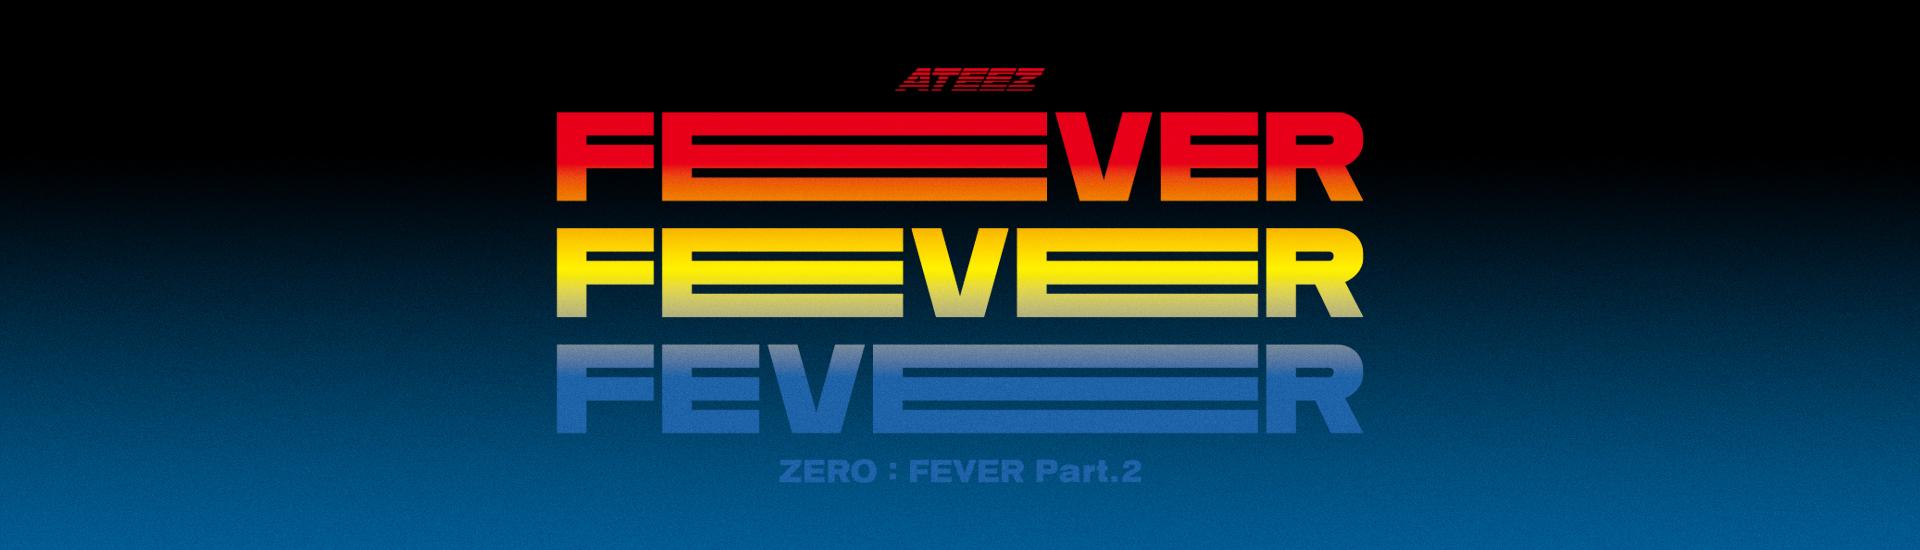 ATEEZ - ZERO : FEVER Part.2 Global Online Fansign Event